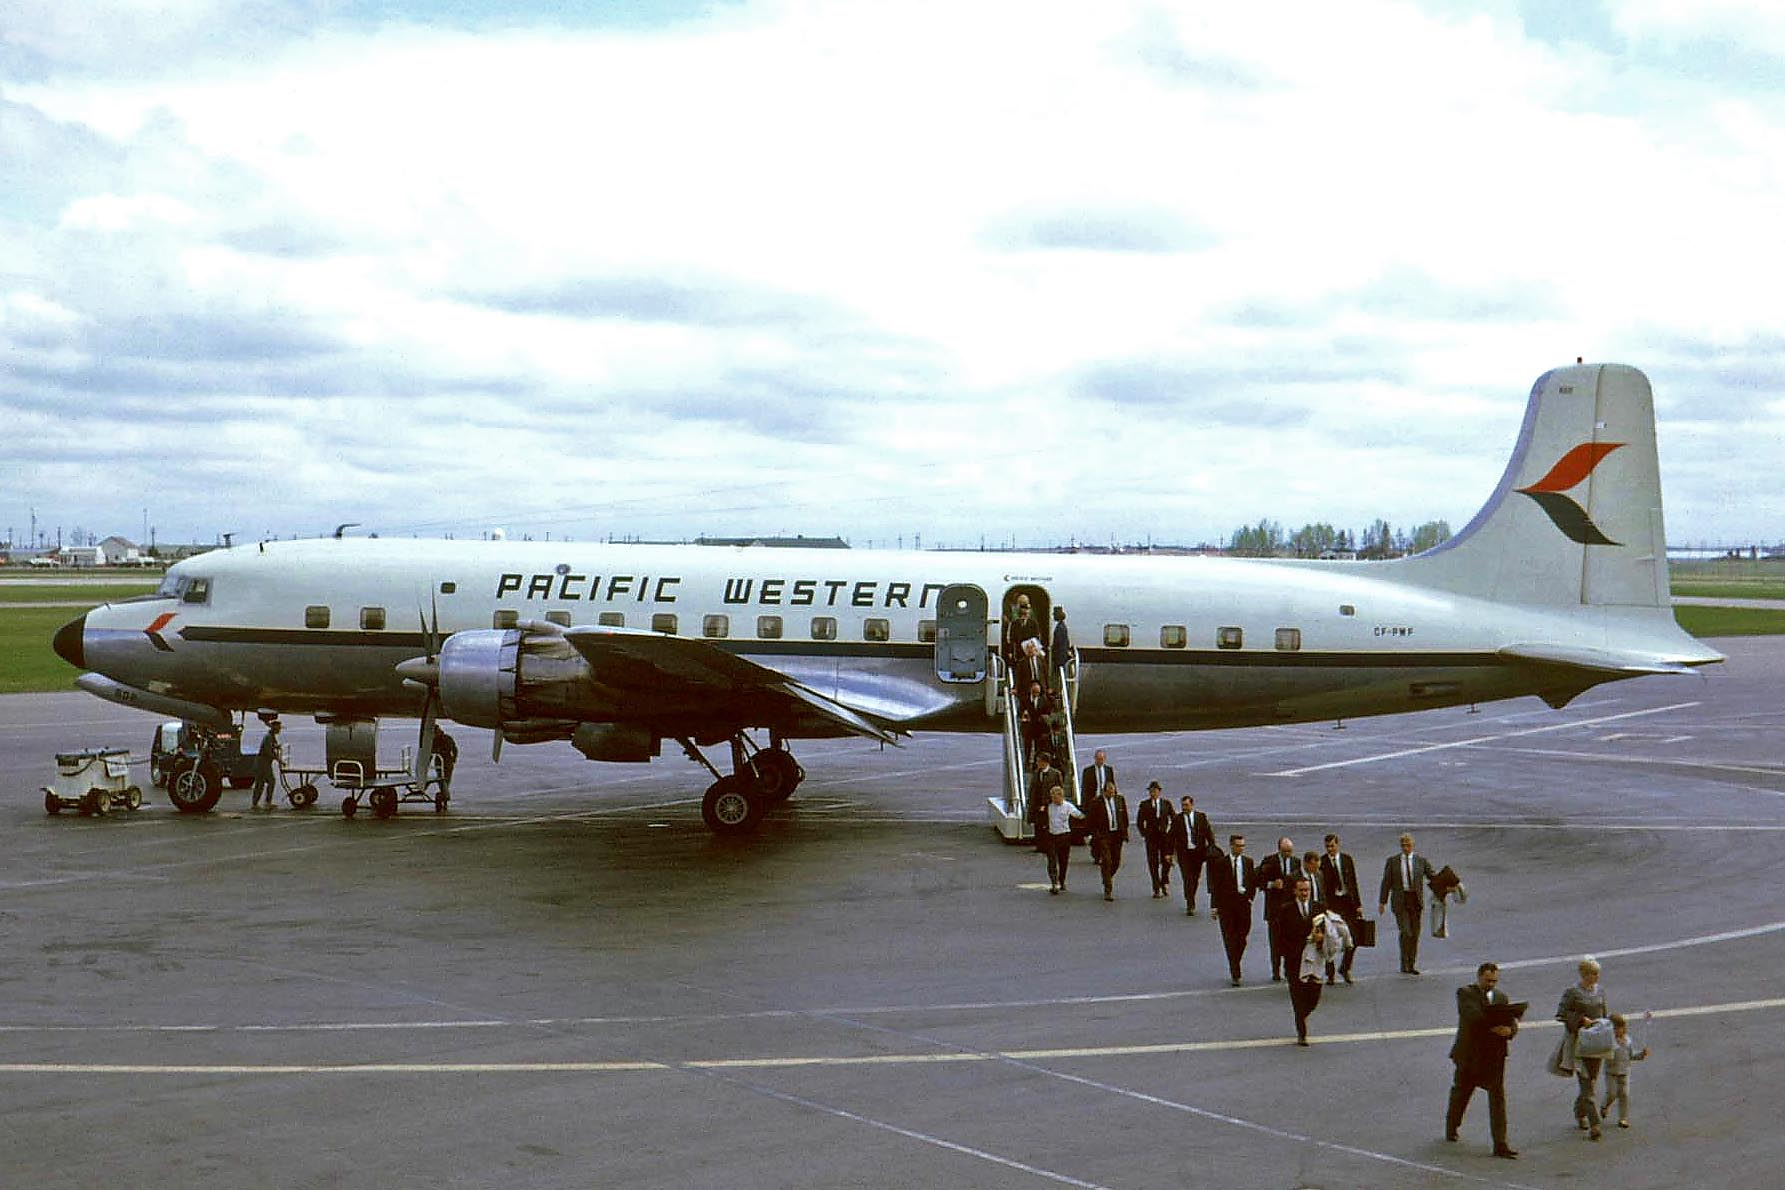 CF-PWF_DC-6B_Pacific_Western_YYC_01JUN67